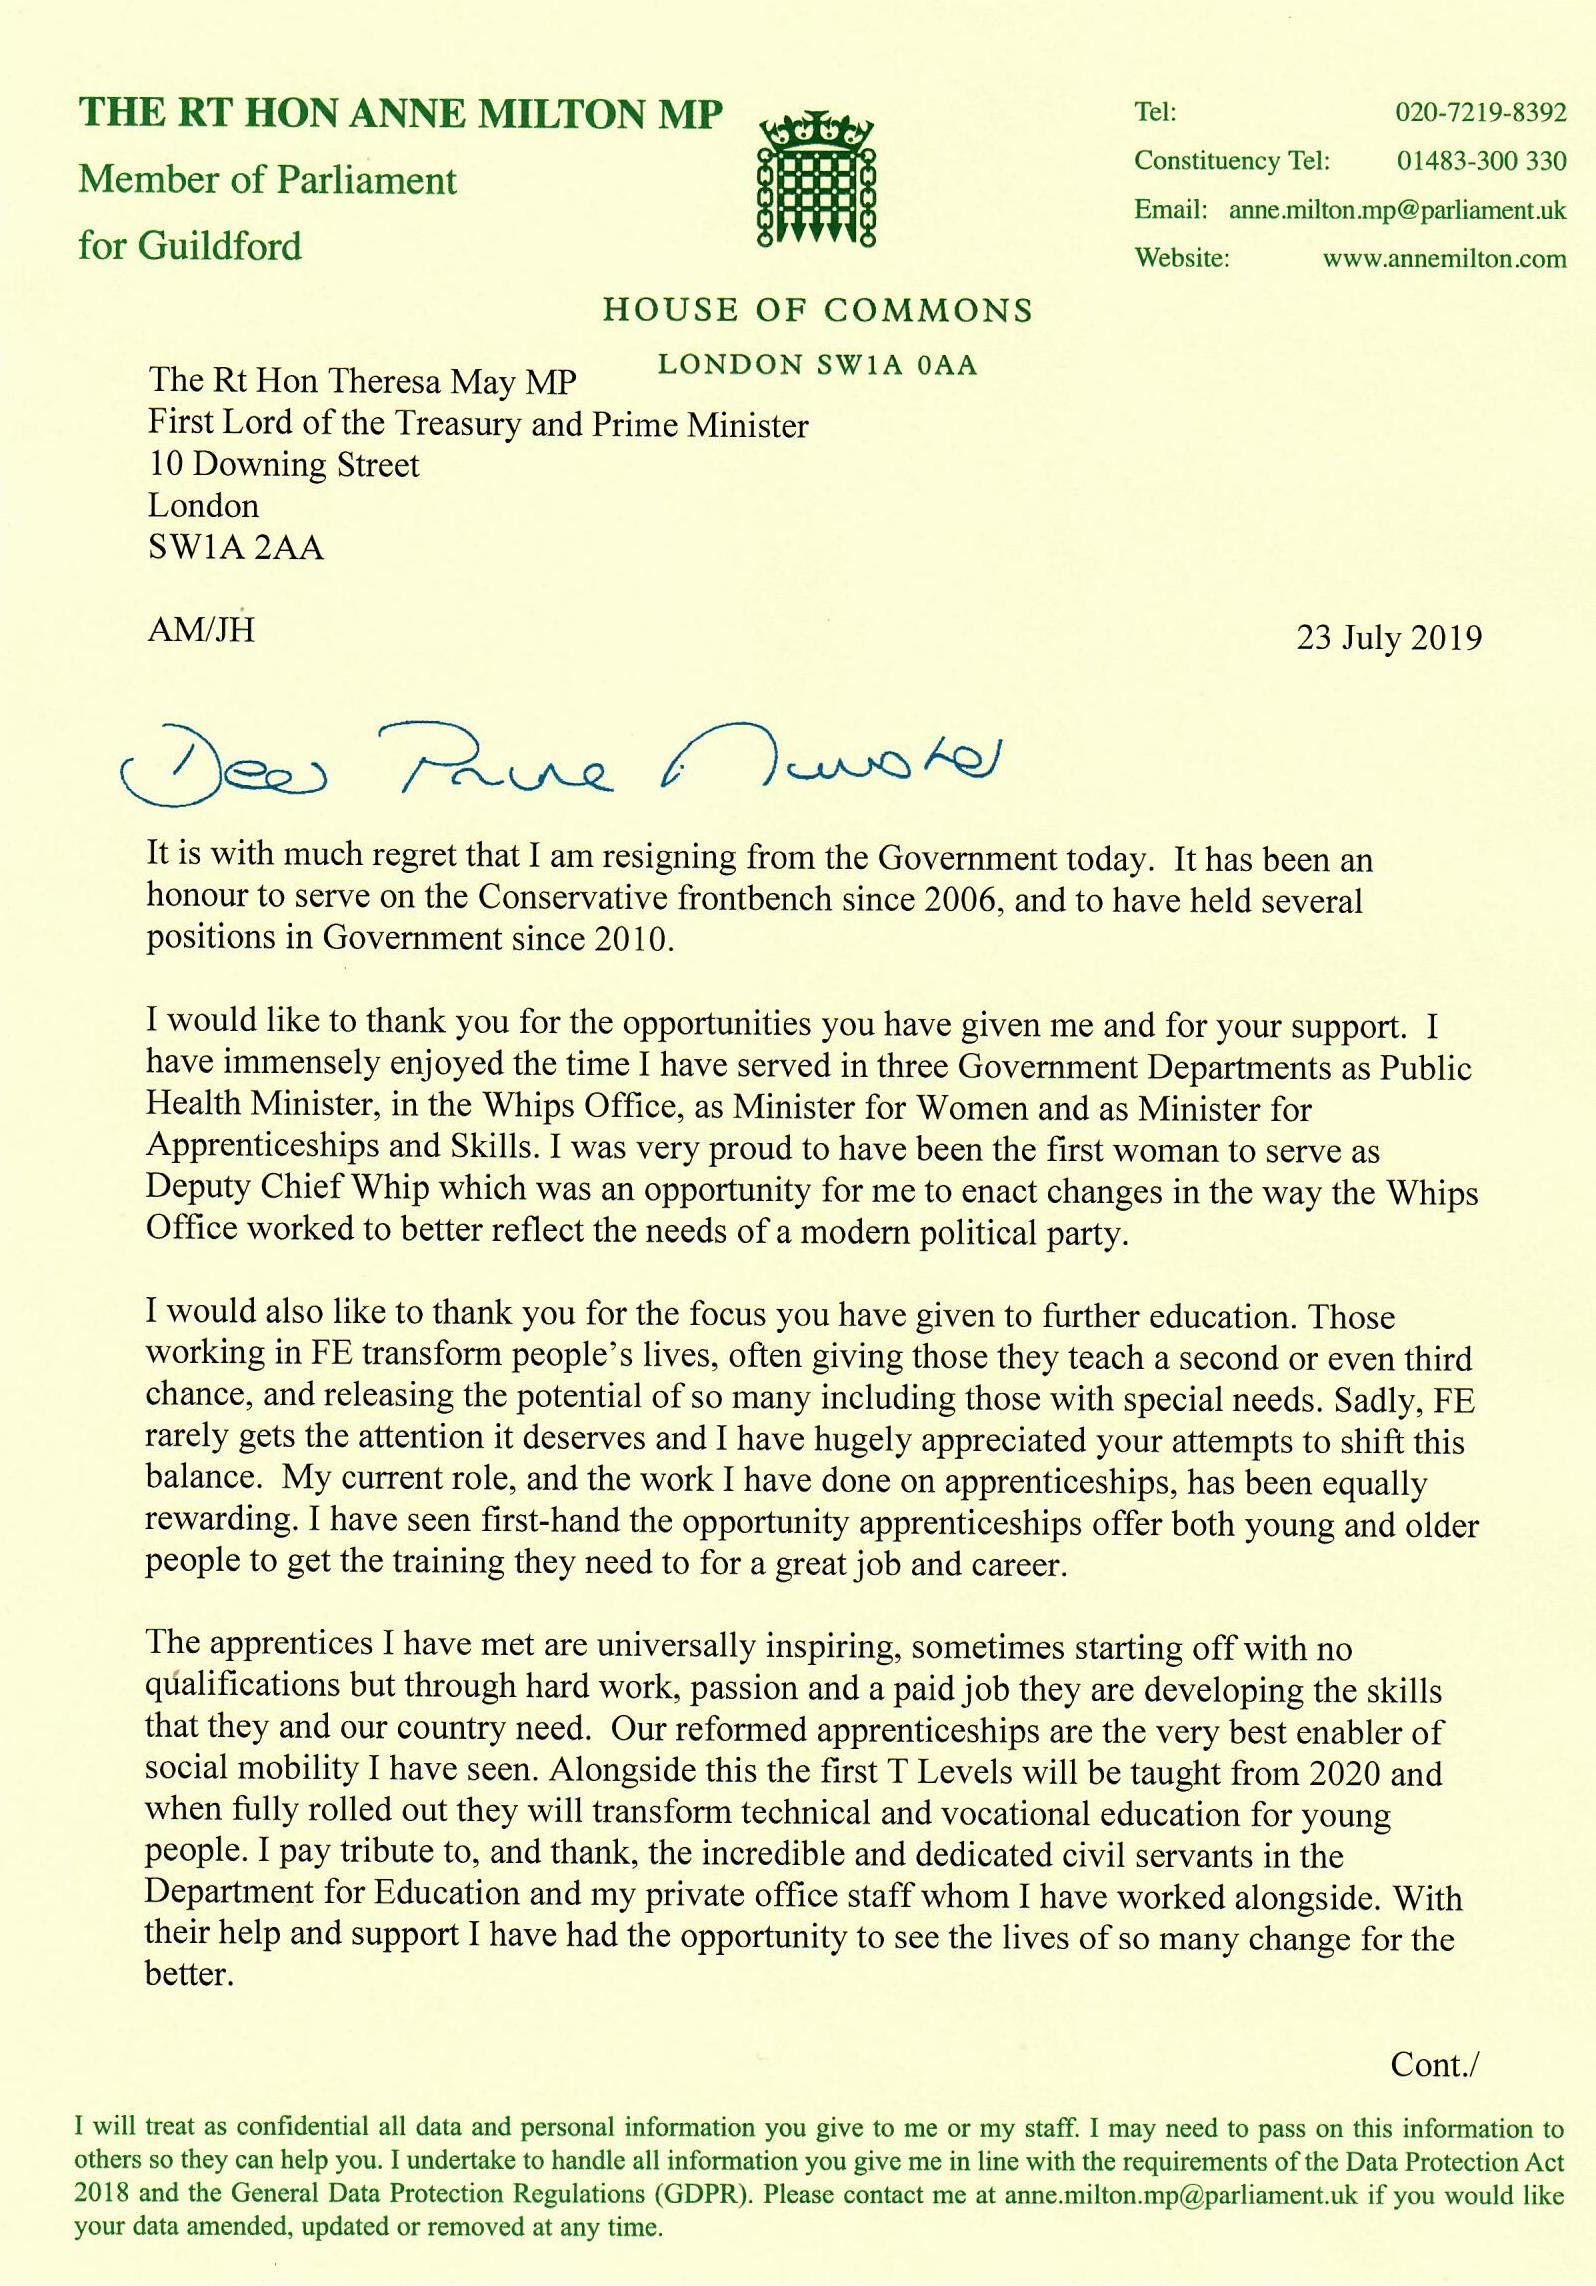 Milton resignation letter